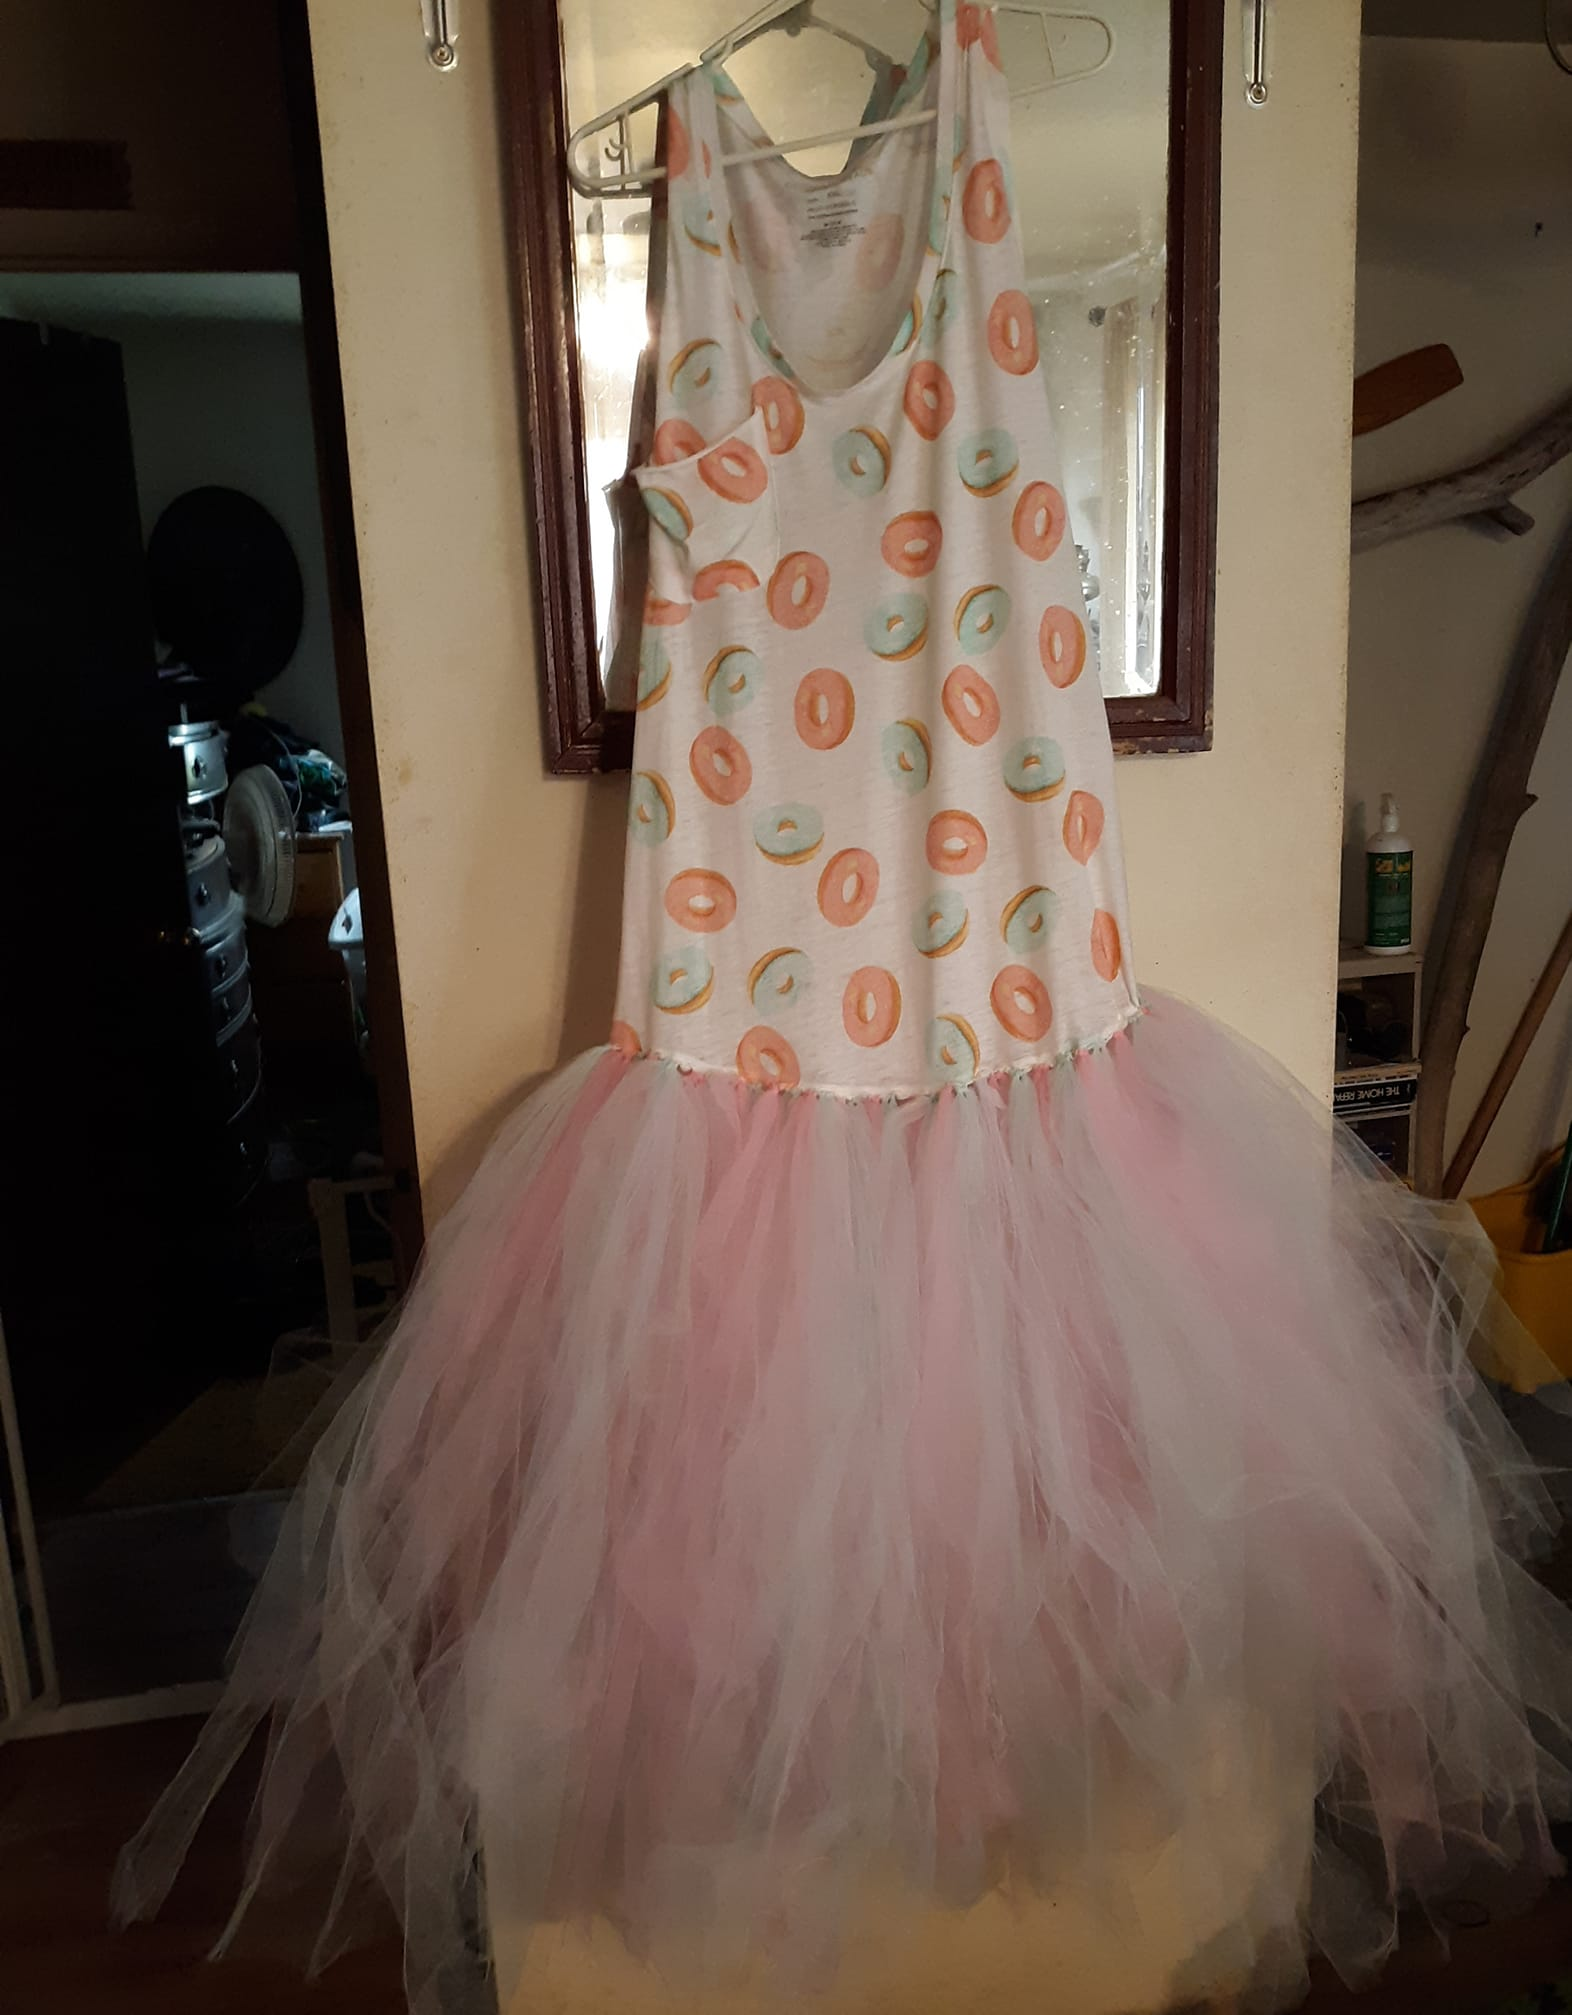 Plus Size tutu Dress sold by Creepy Little Ones